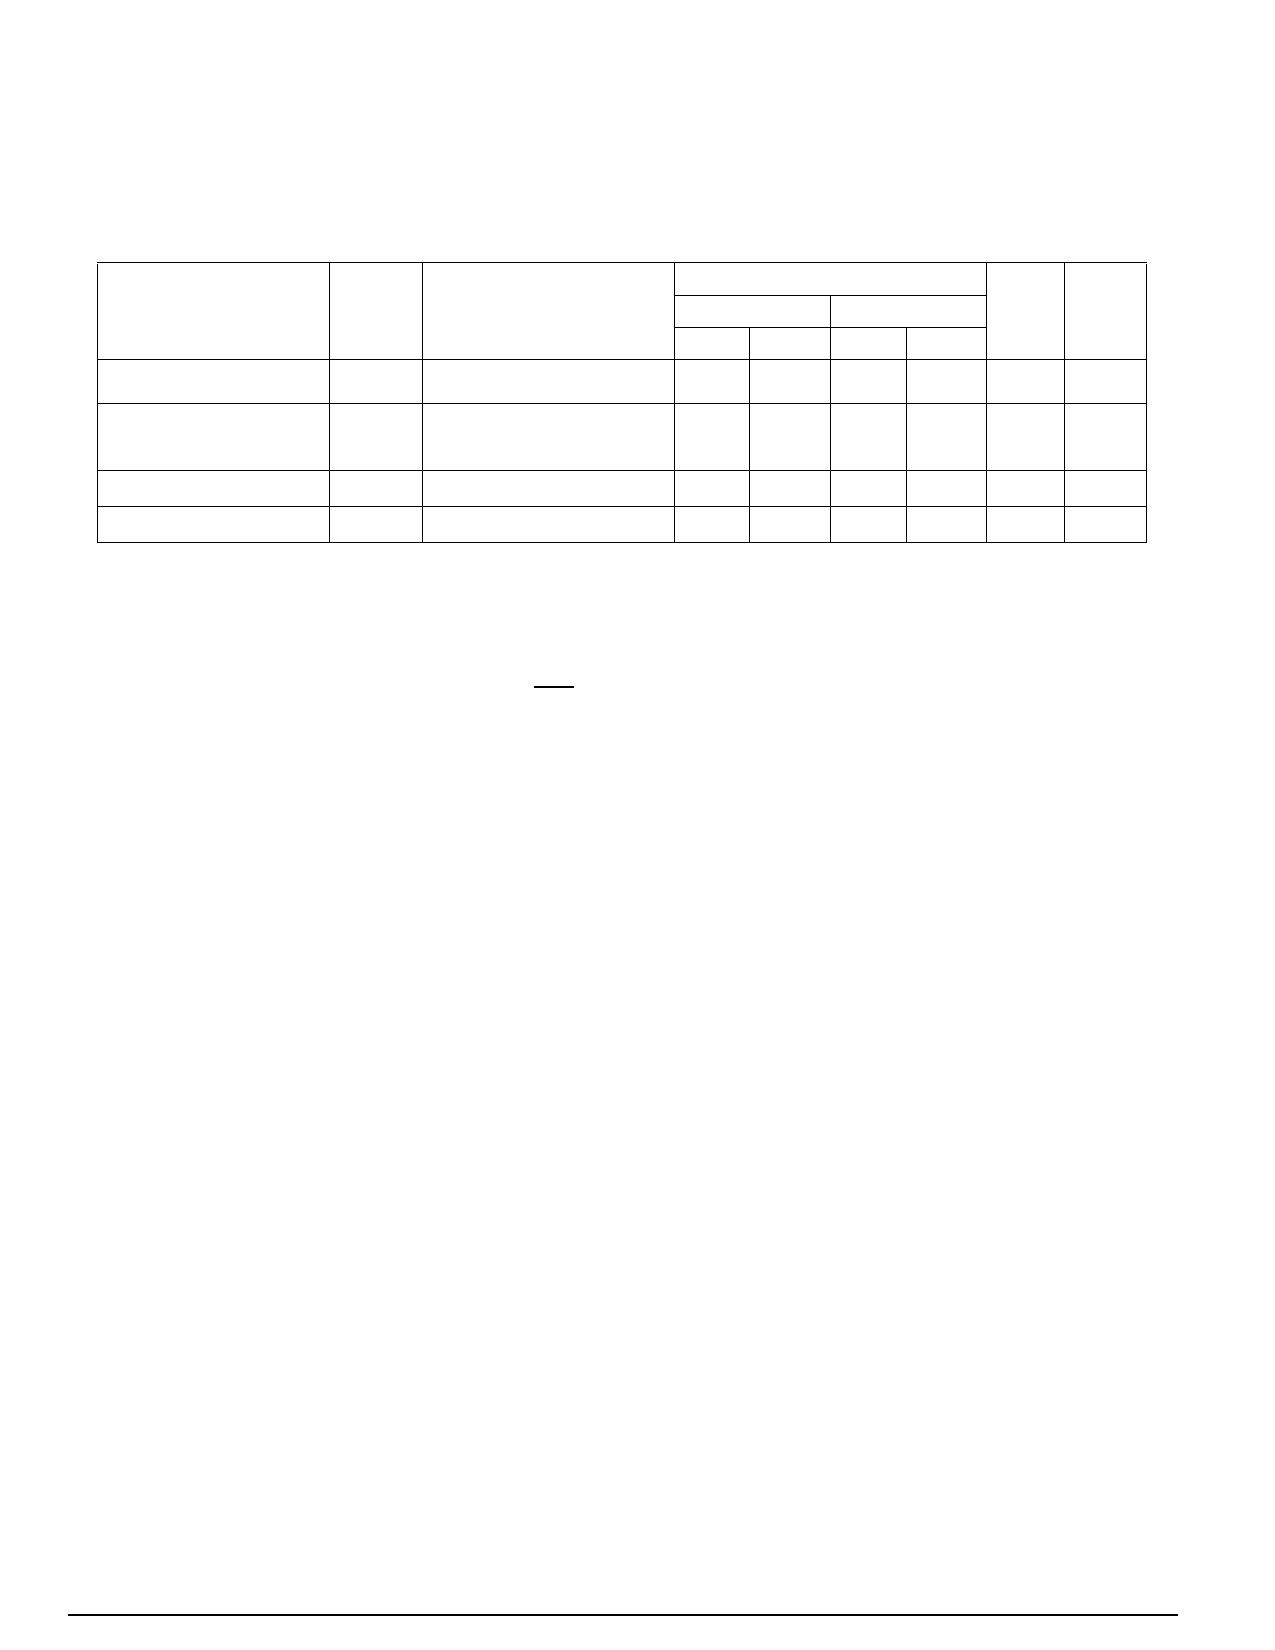 AD401M86RLB-5 diode, scr